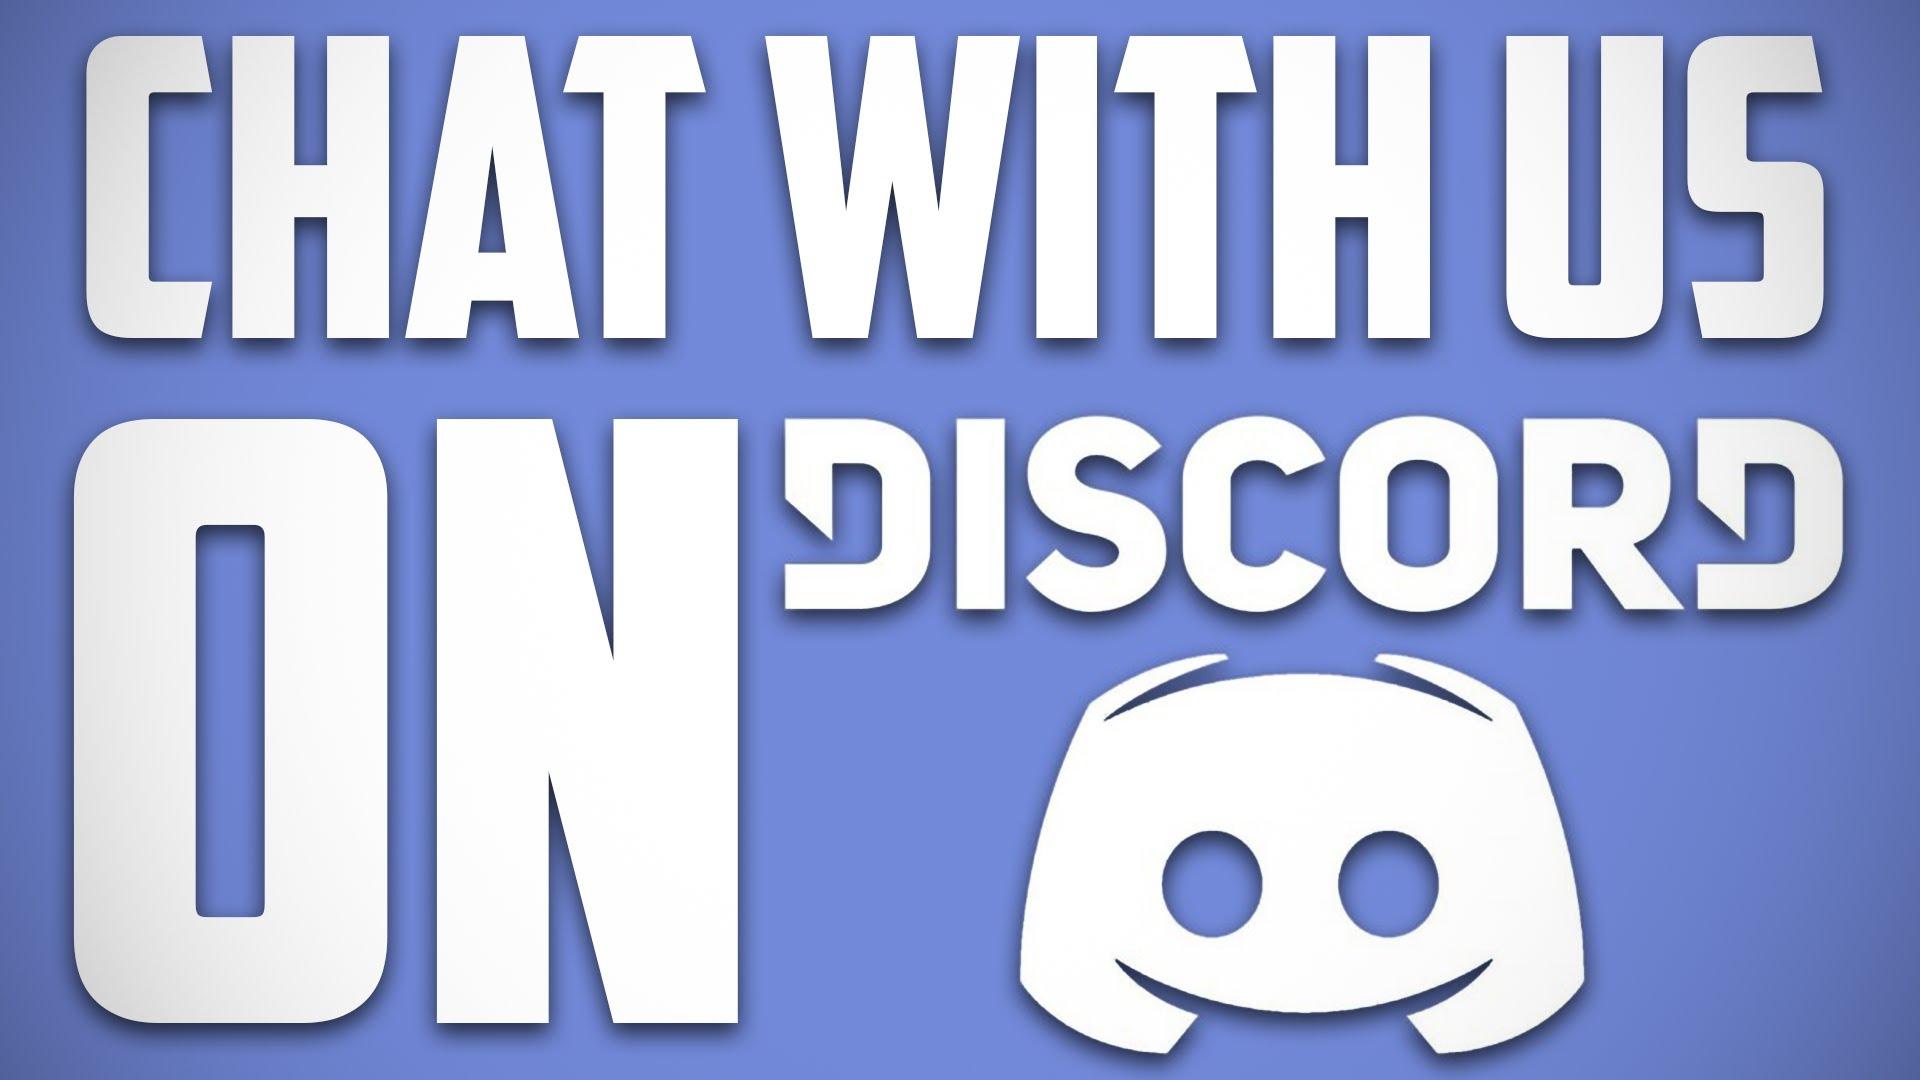 chatdiscord